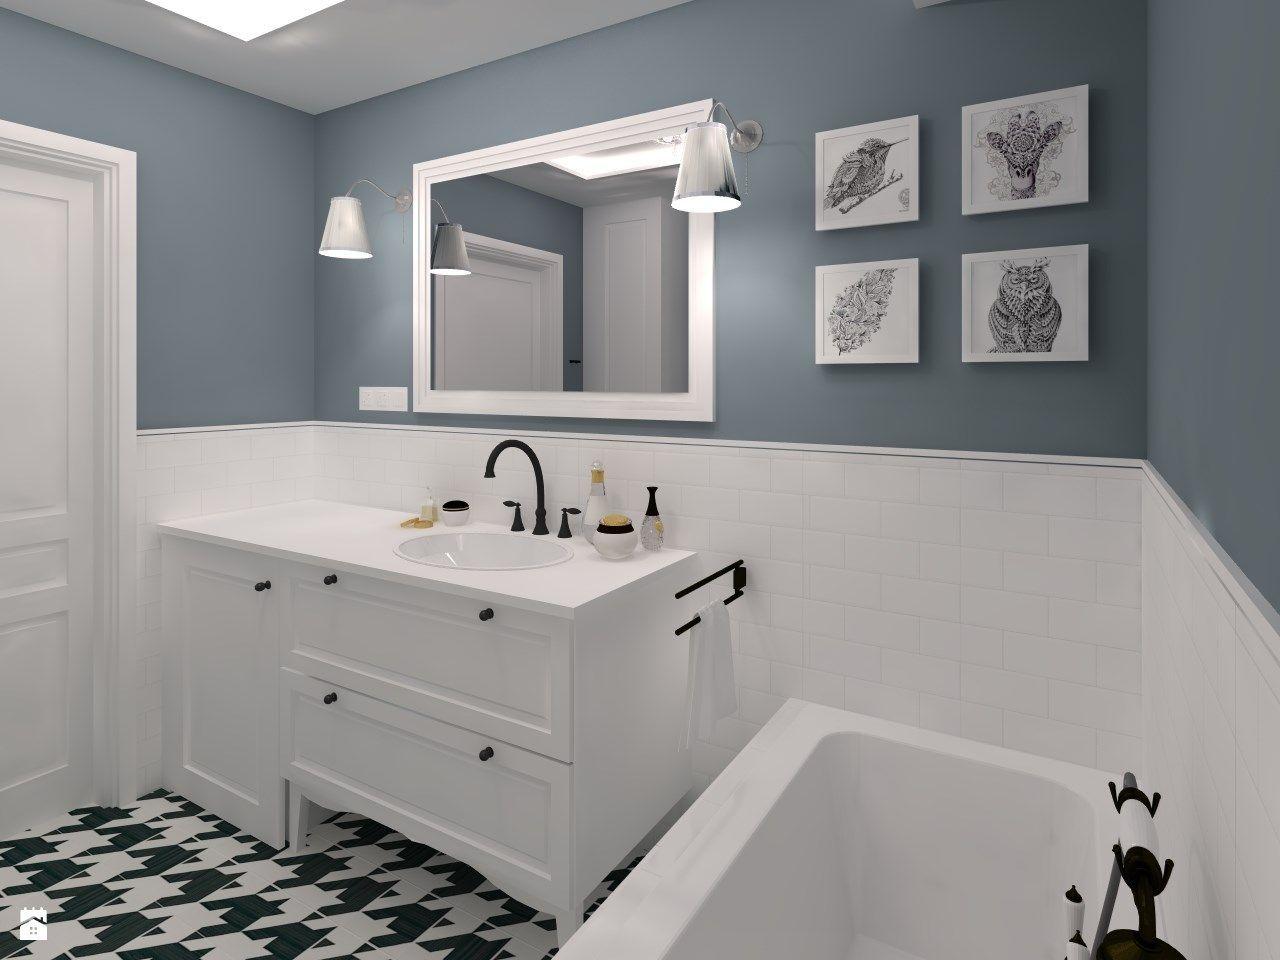 50 Fairy Bathroom Decor Check More At Https Www Michelenails Com 55 Fairy Bathroom Decor Small Bathroom Makeover Bathroom Remodel Cost Bathroom Makeover